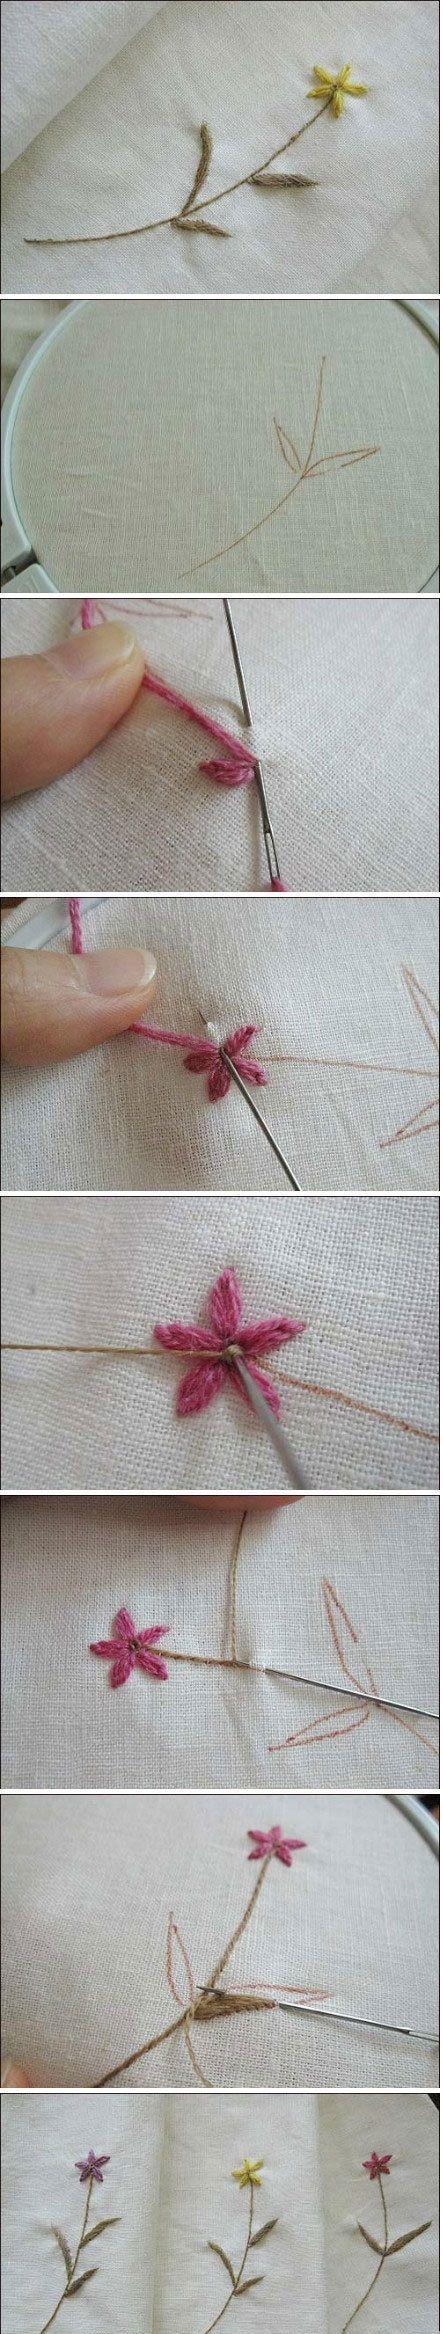 Embroider A Flower Diy